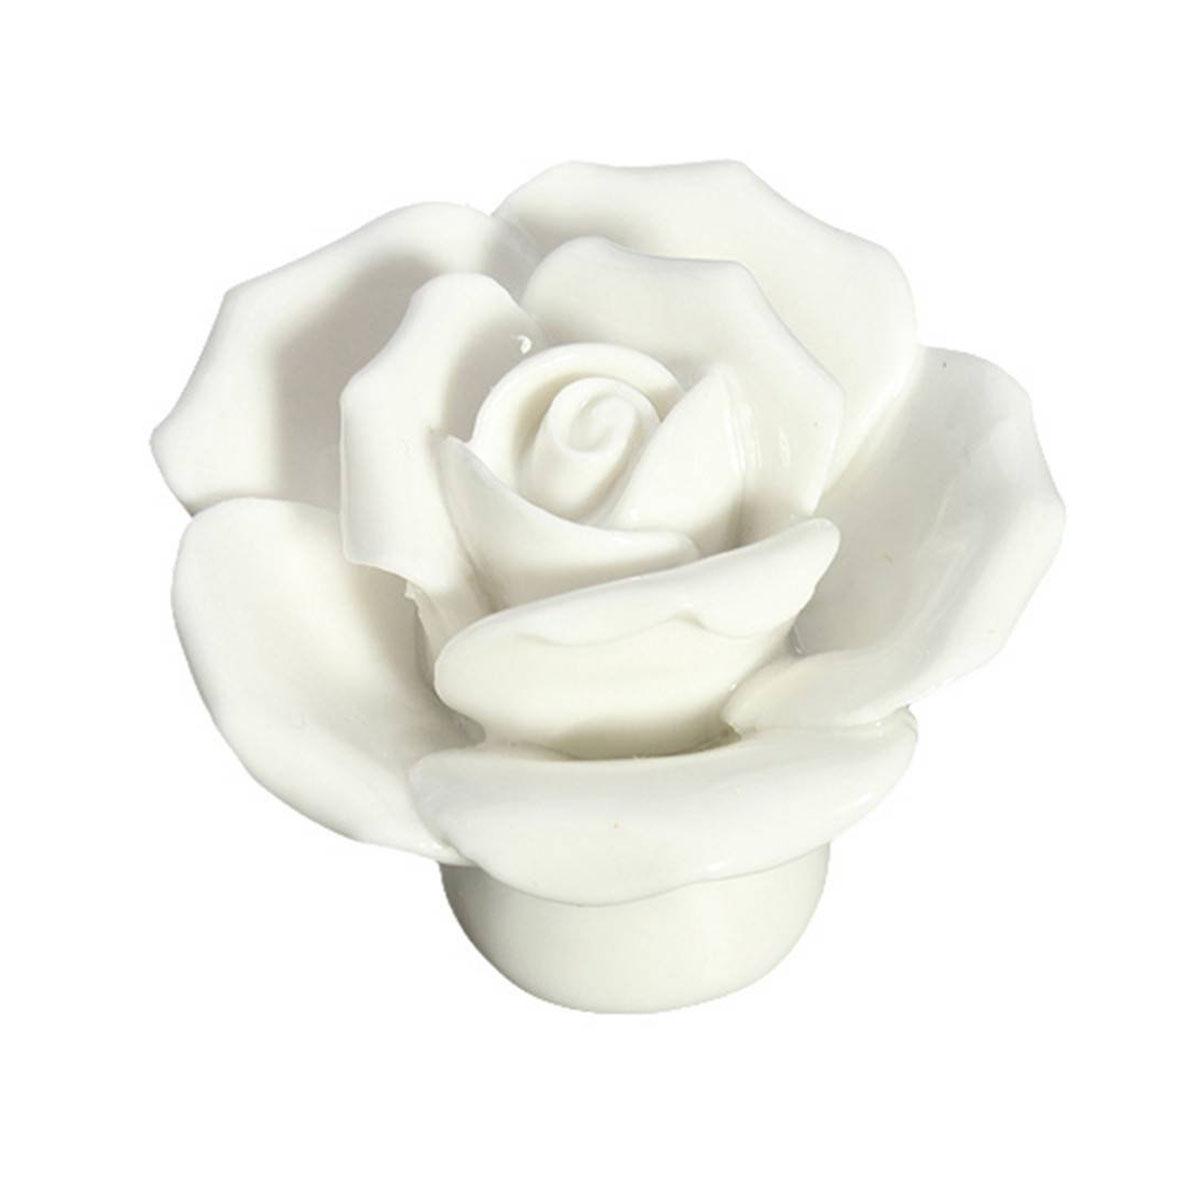 10pcs Vintage Rose Flower Ceramic Door Knobs Handle Drawer White<br><br>Aliexpress